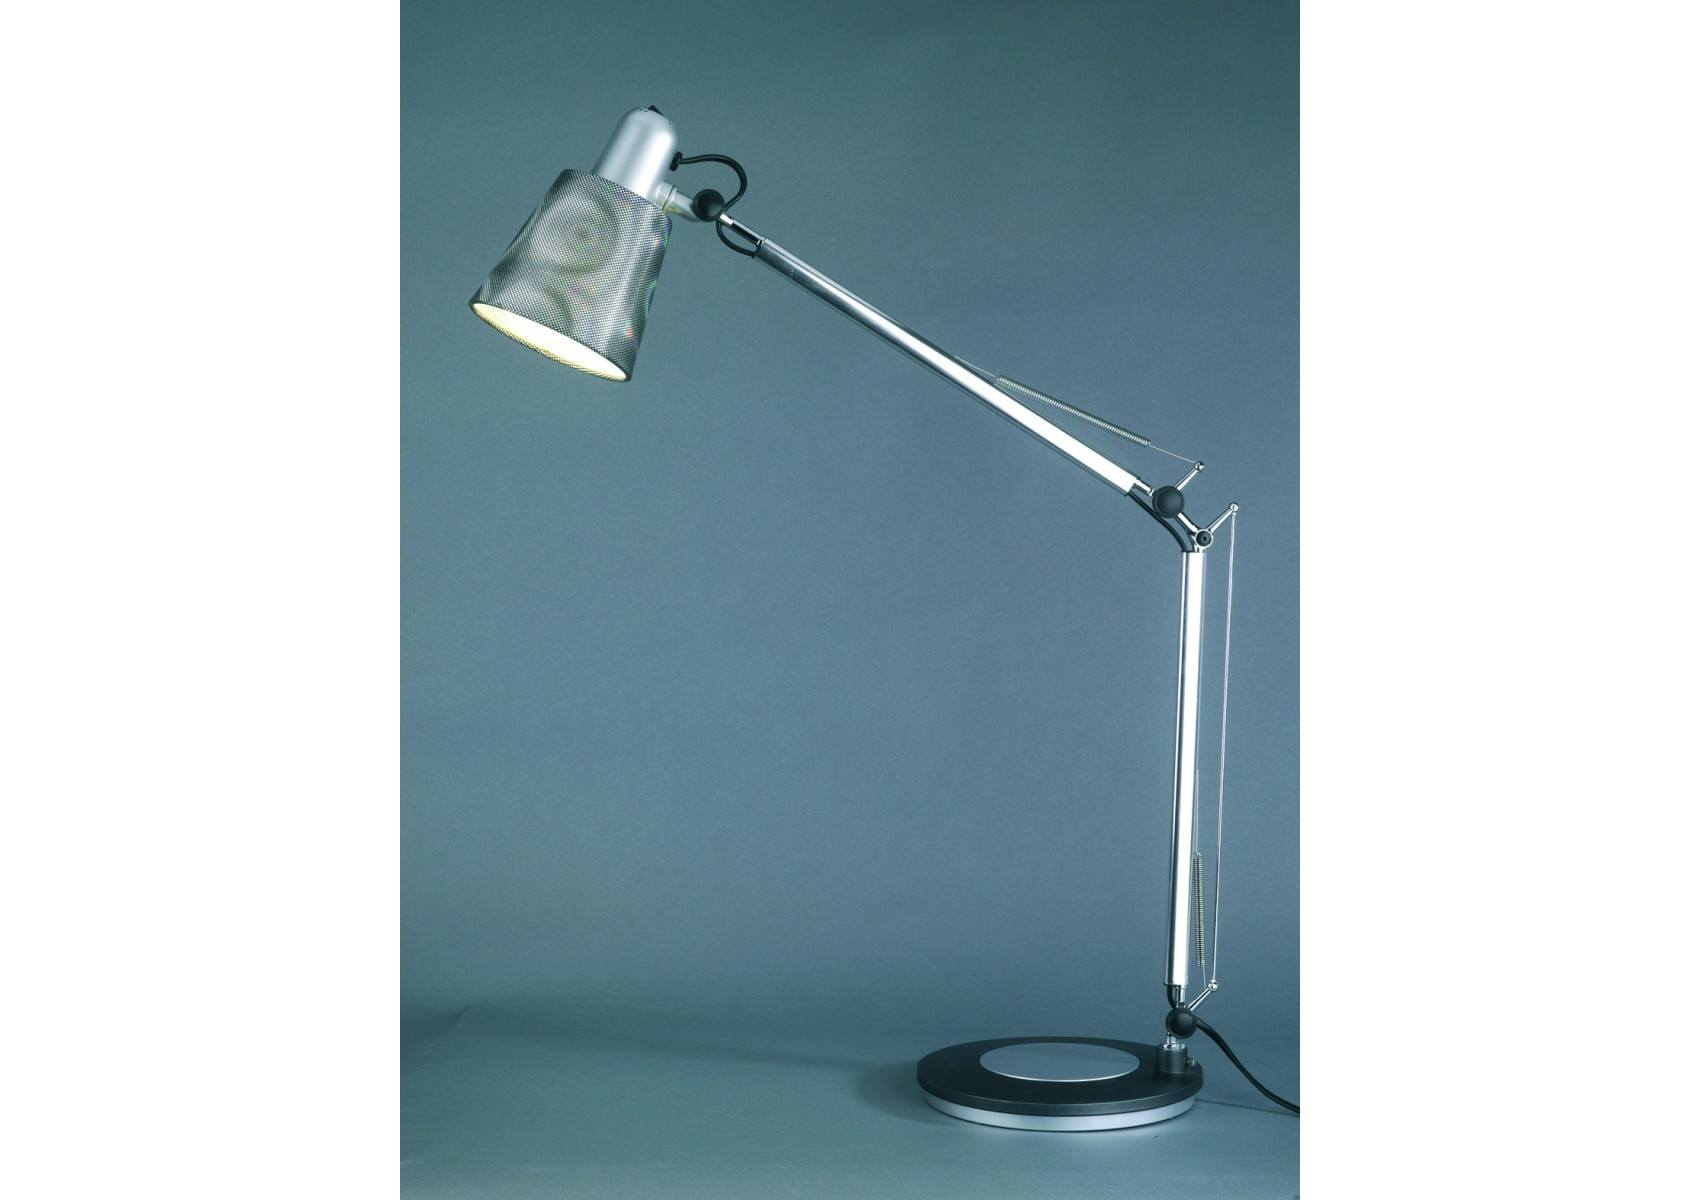 Lampe de bureau casting2 design et son tau d 39 accroche - Lampe de bureau design ...